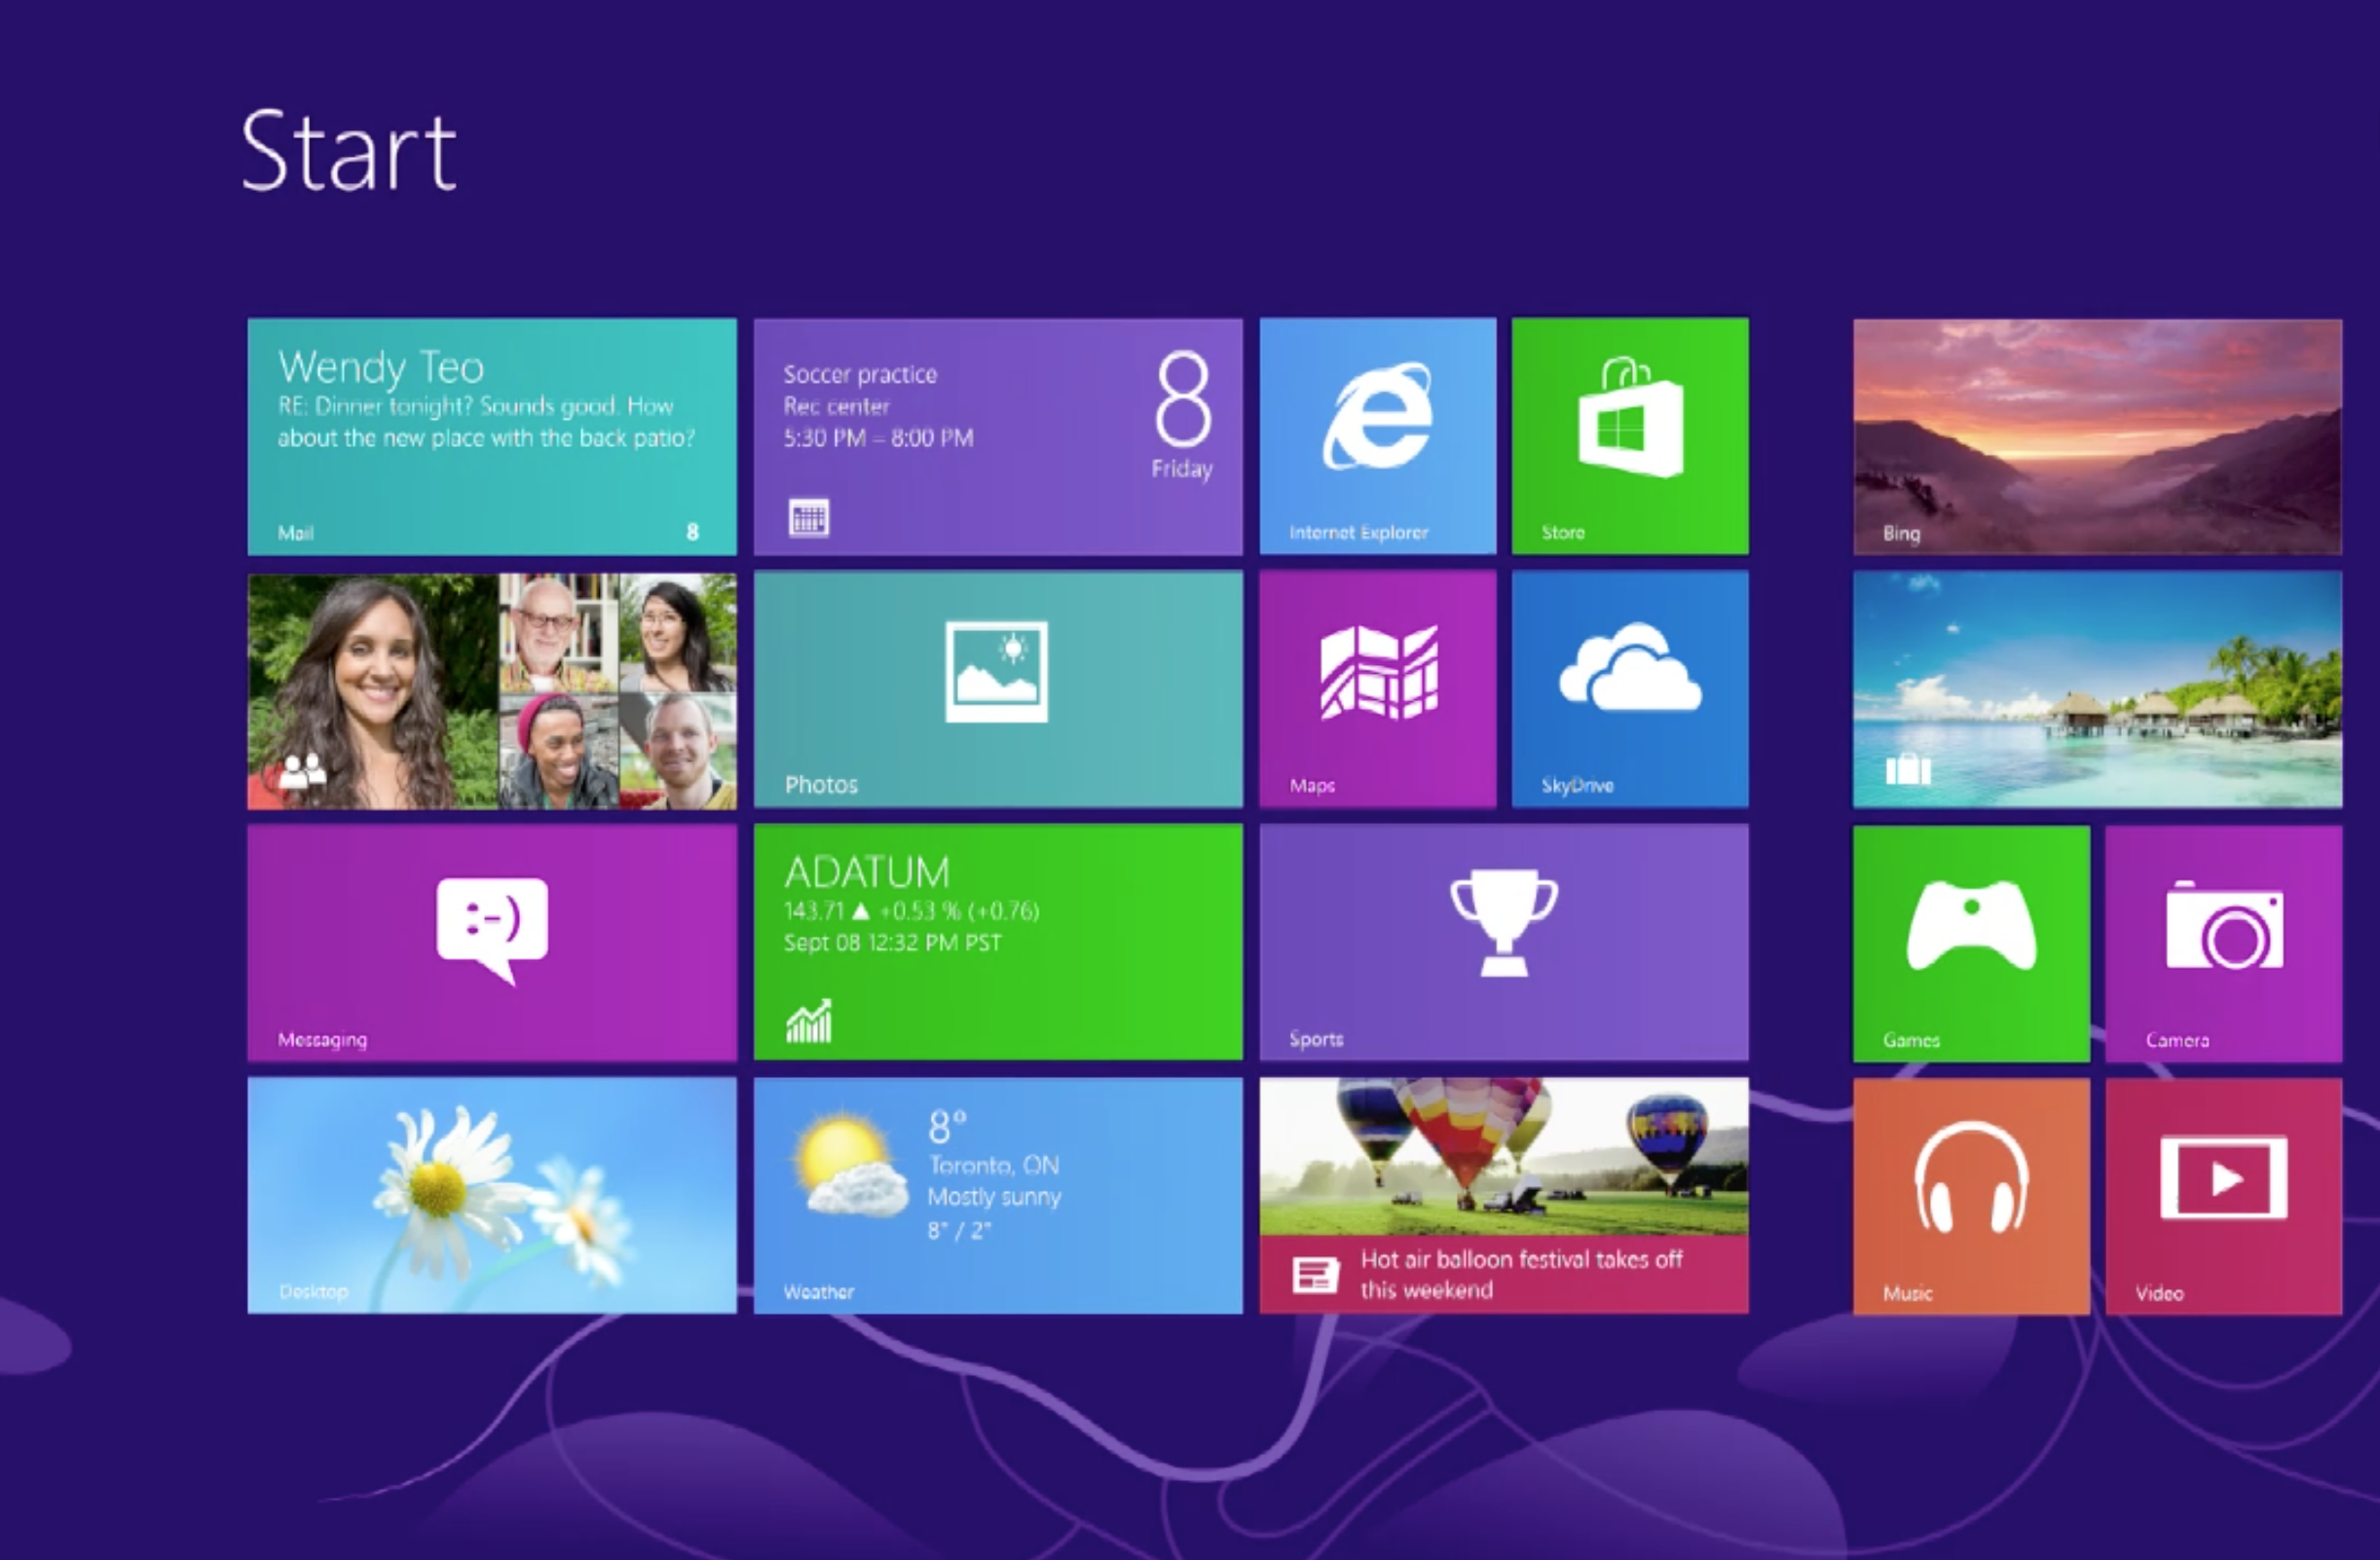 Windows 8 Start screen 2444x1602